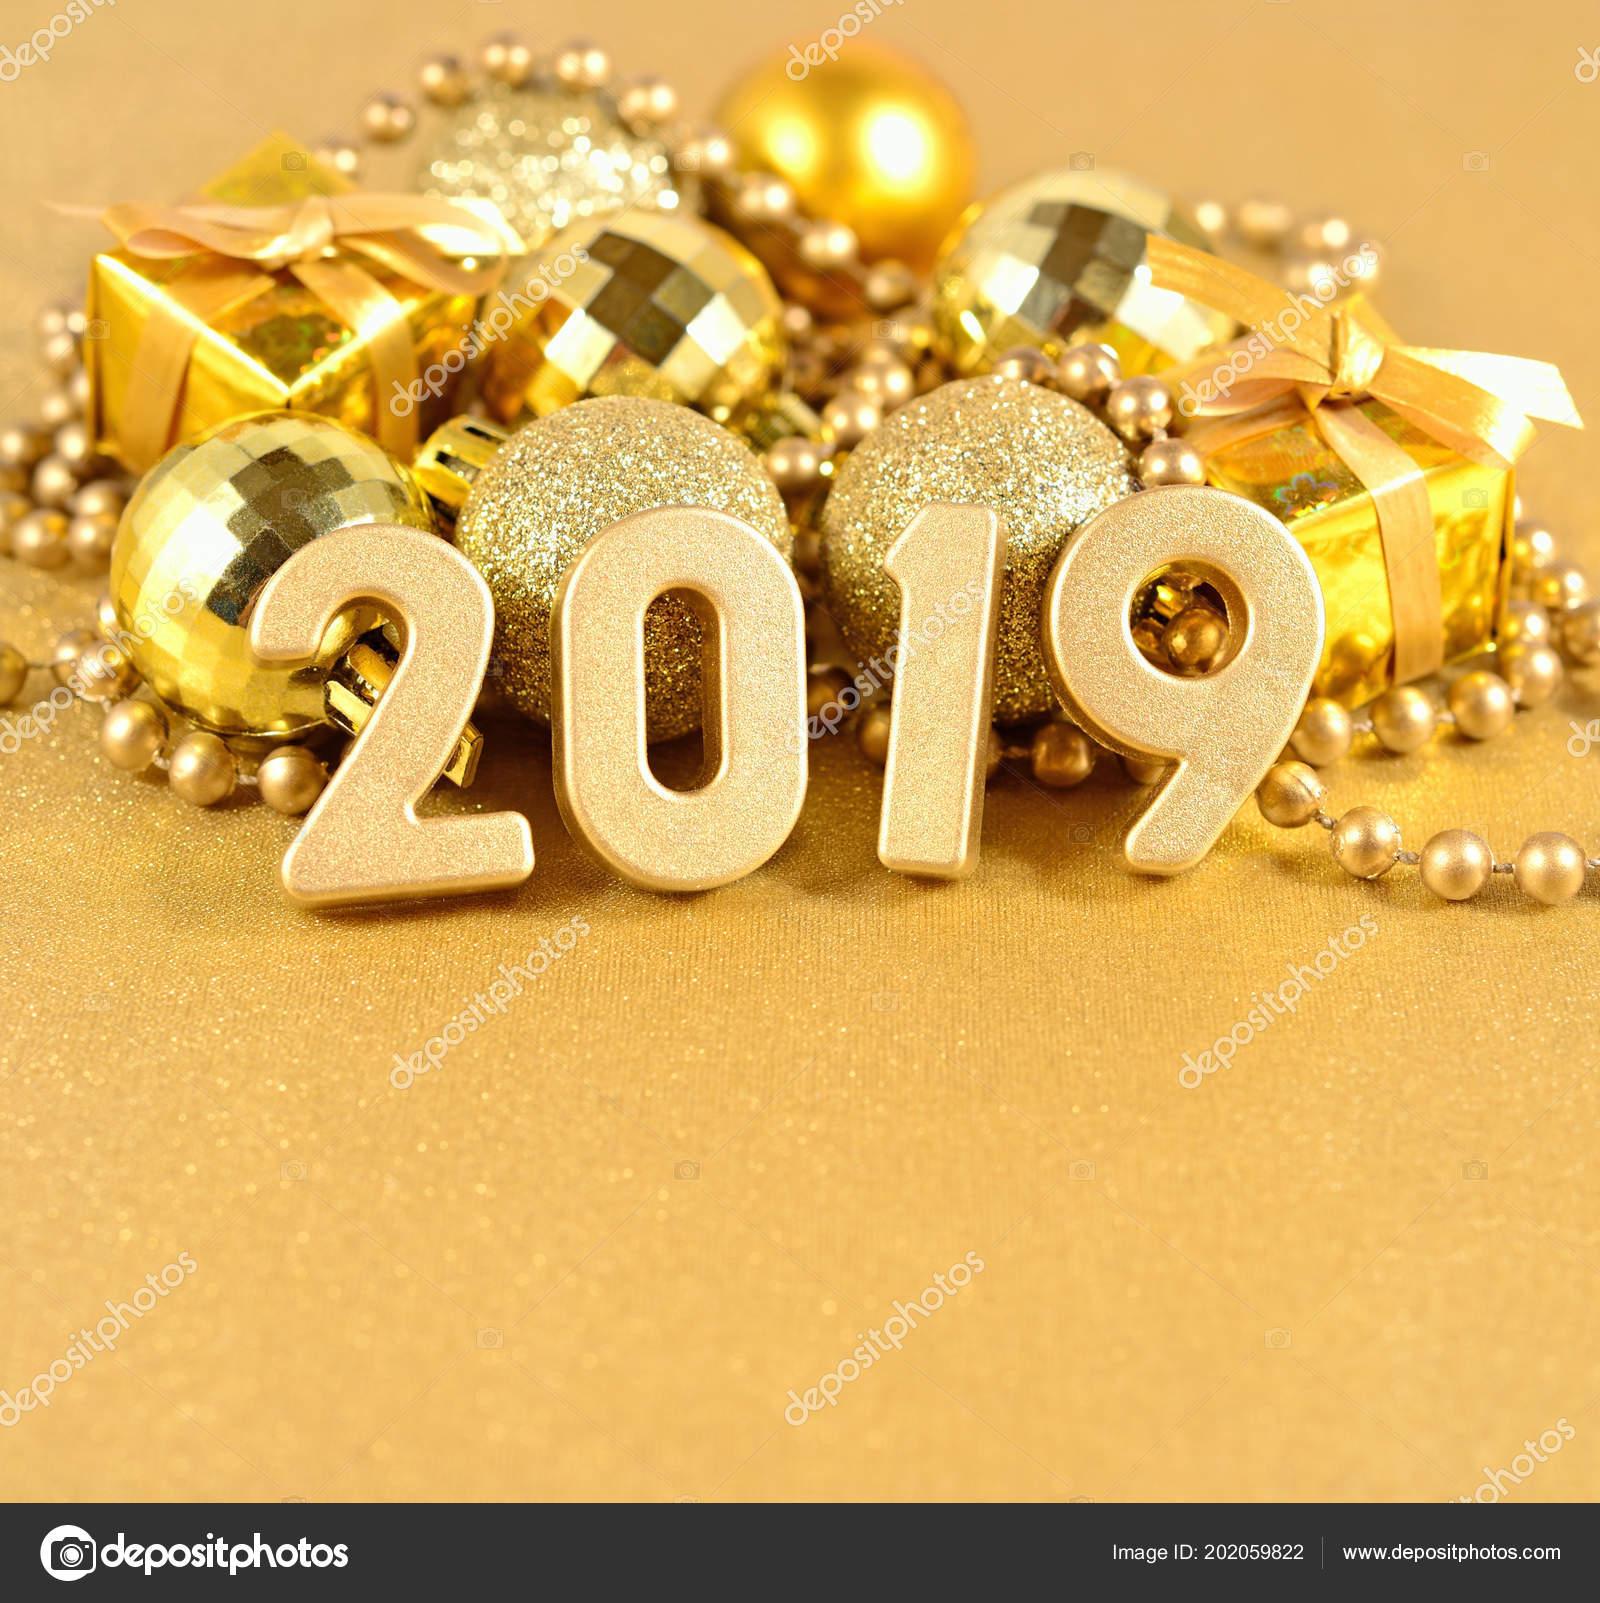 2019 Year Golden Figures Background Golden Christmas Decorations